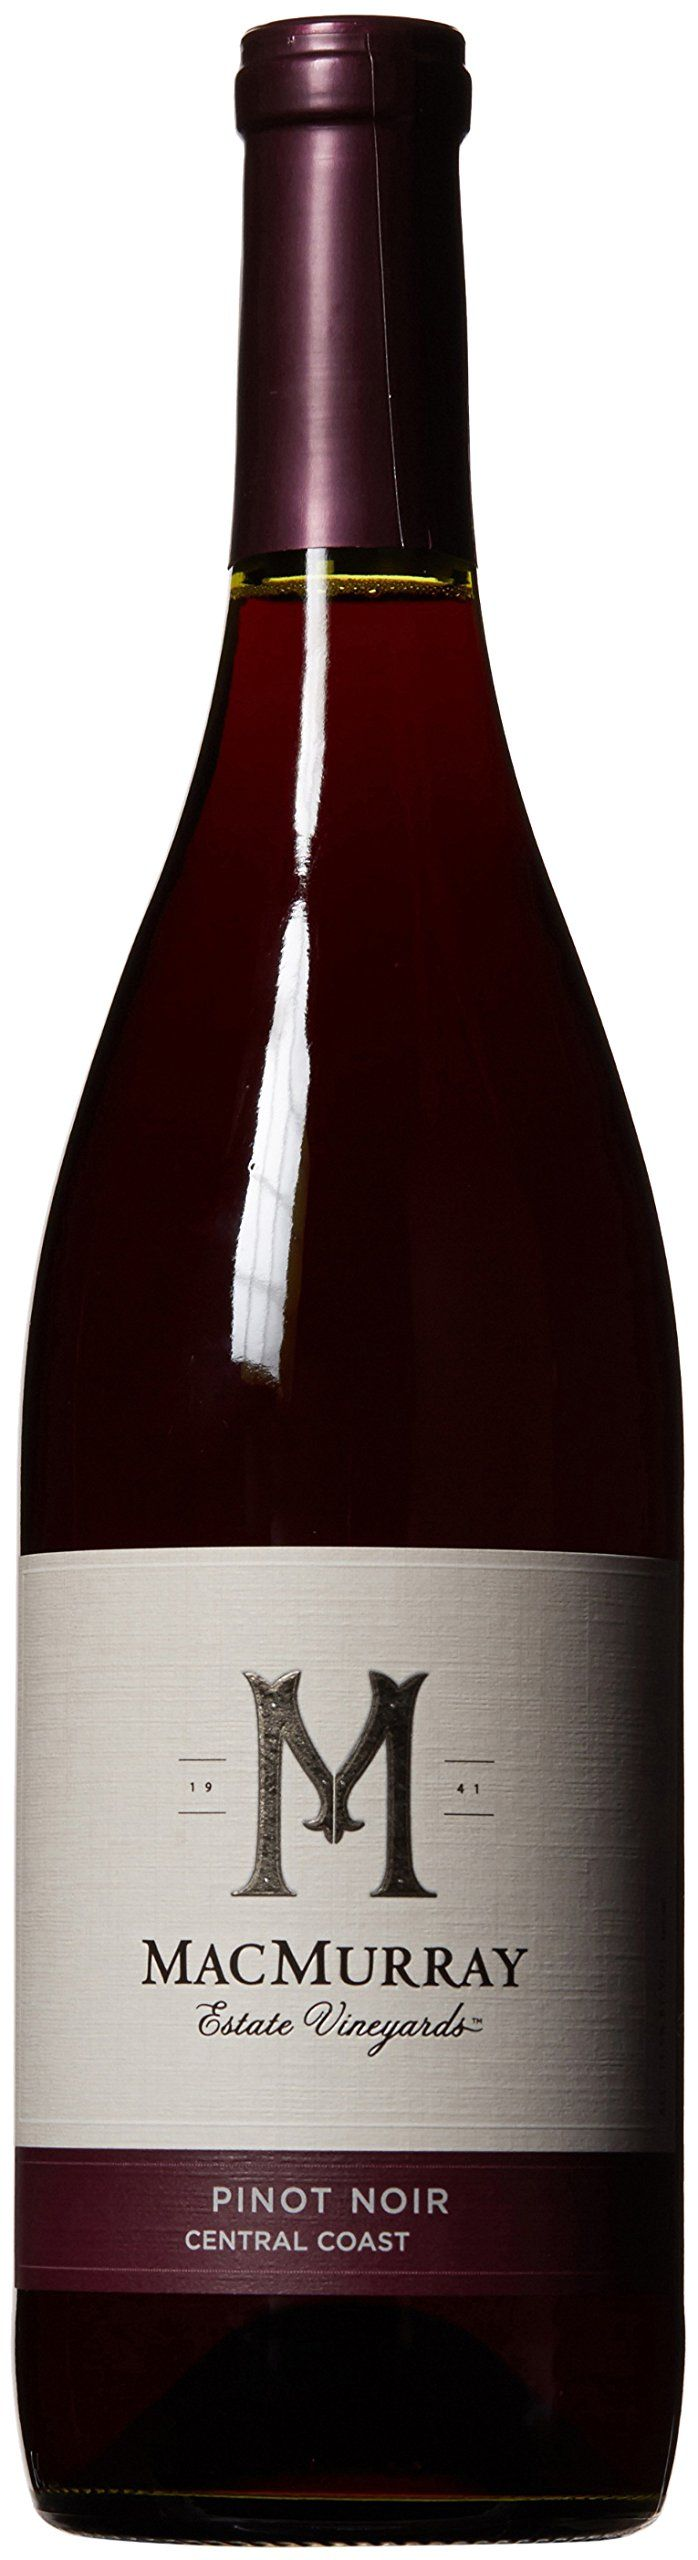 2014 MacMurray Estate Vineyards Central Coast Pinot Noir 750mL at Amazon's Wine Store | @giftryapp